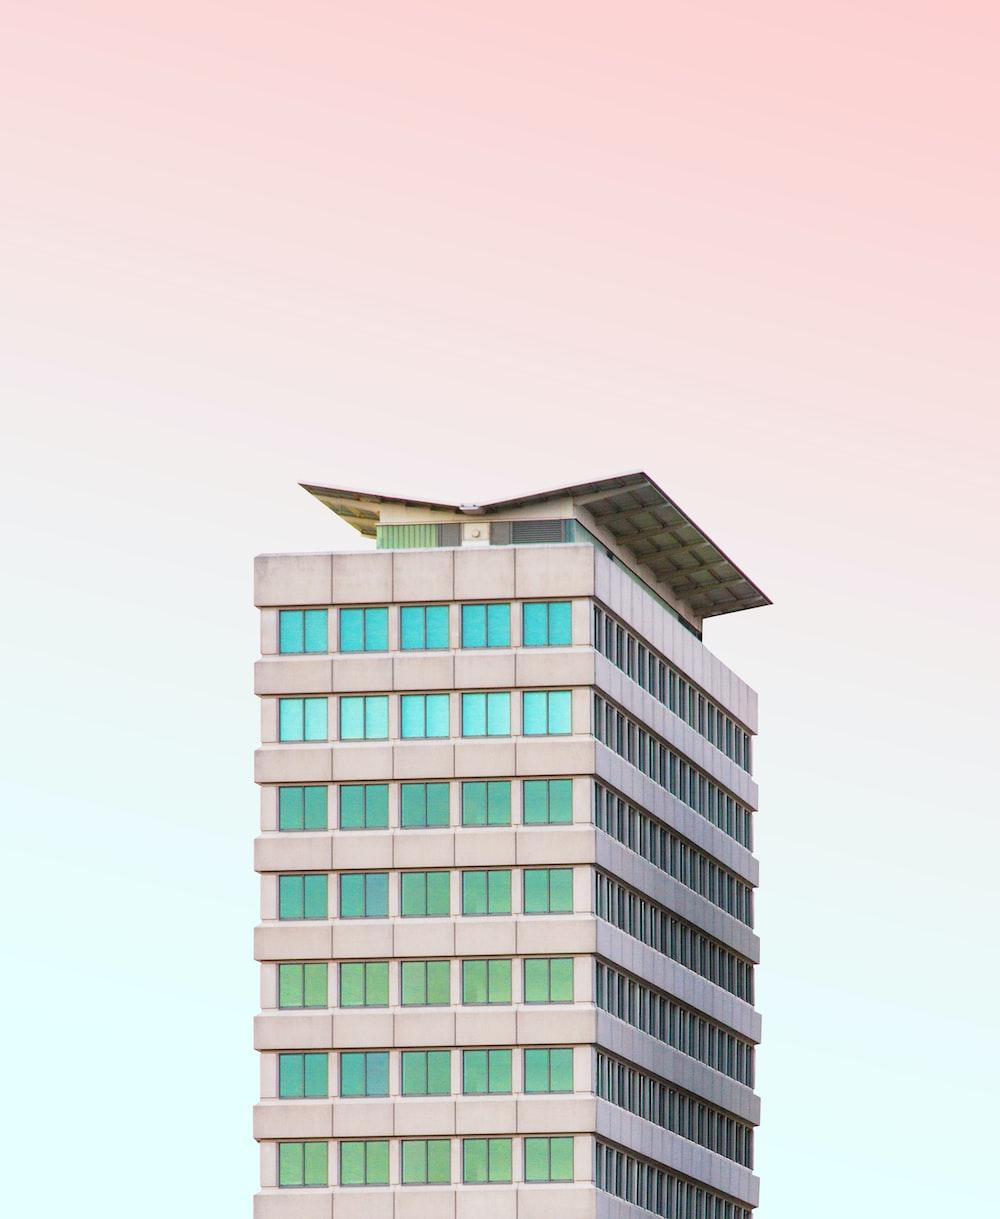 gray concrete building illustration